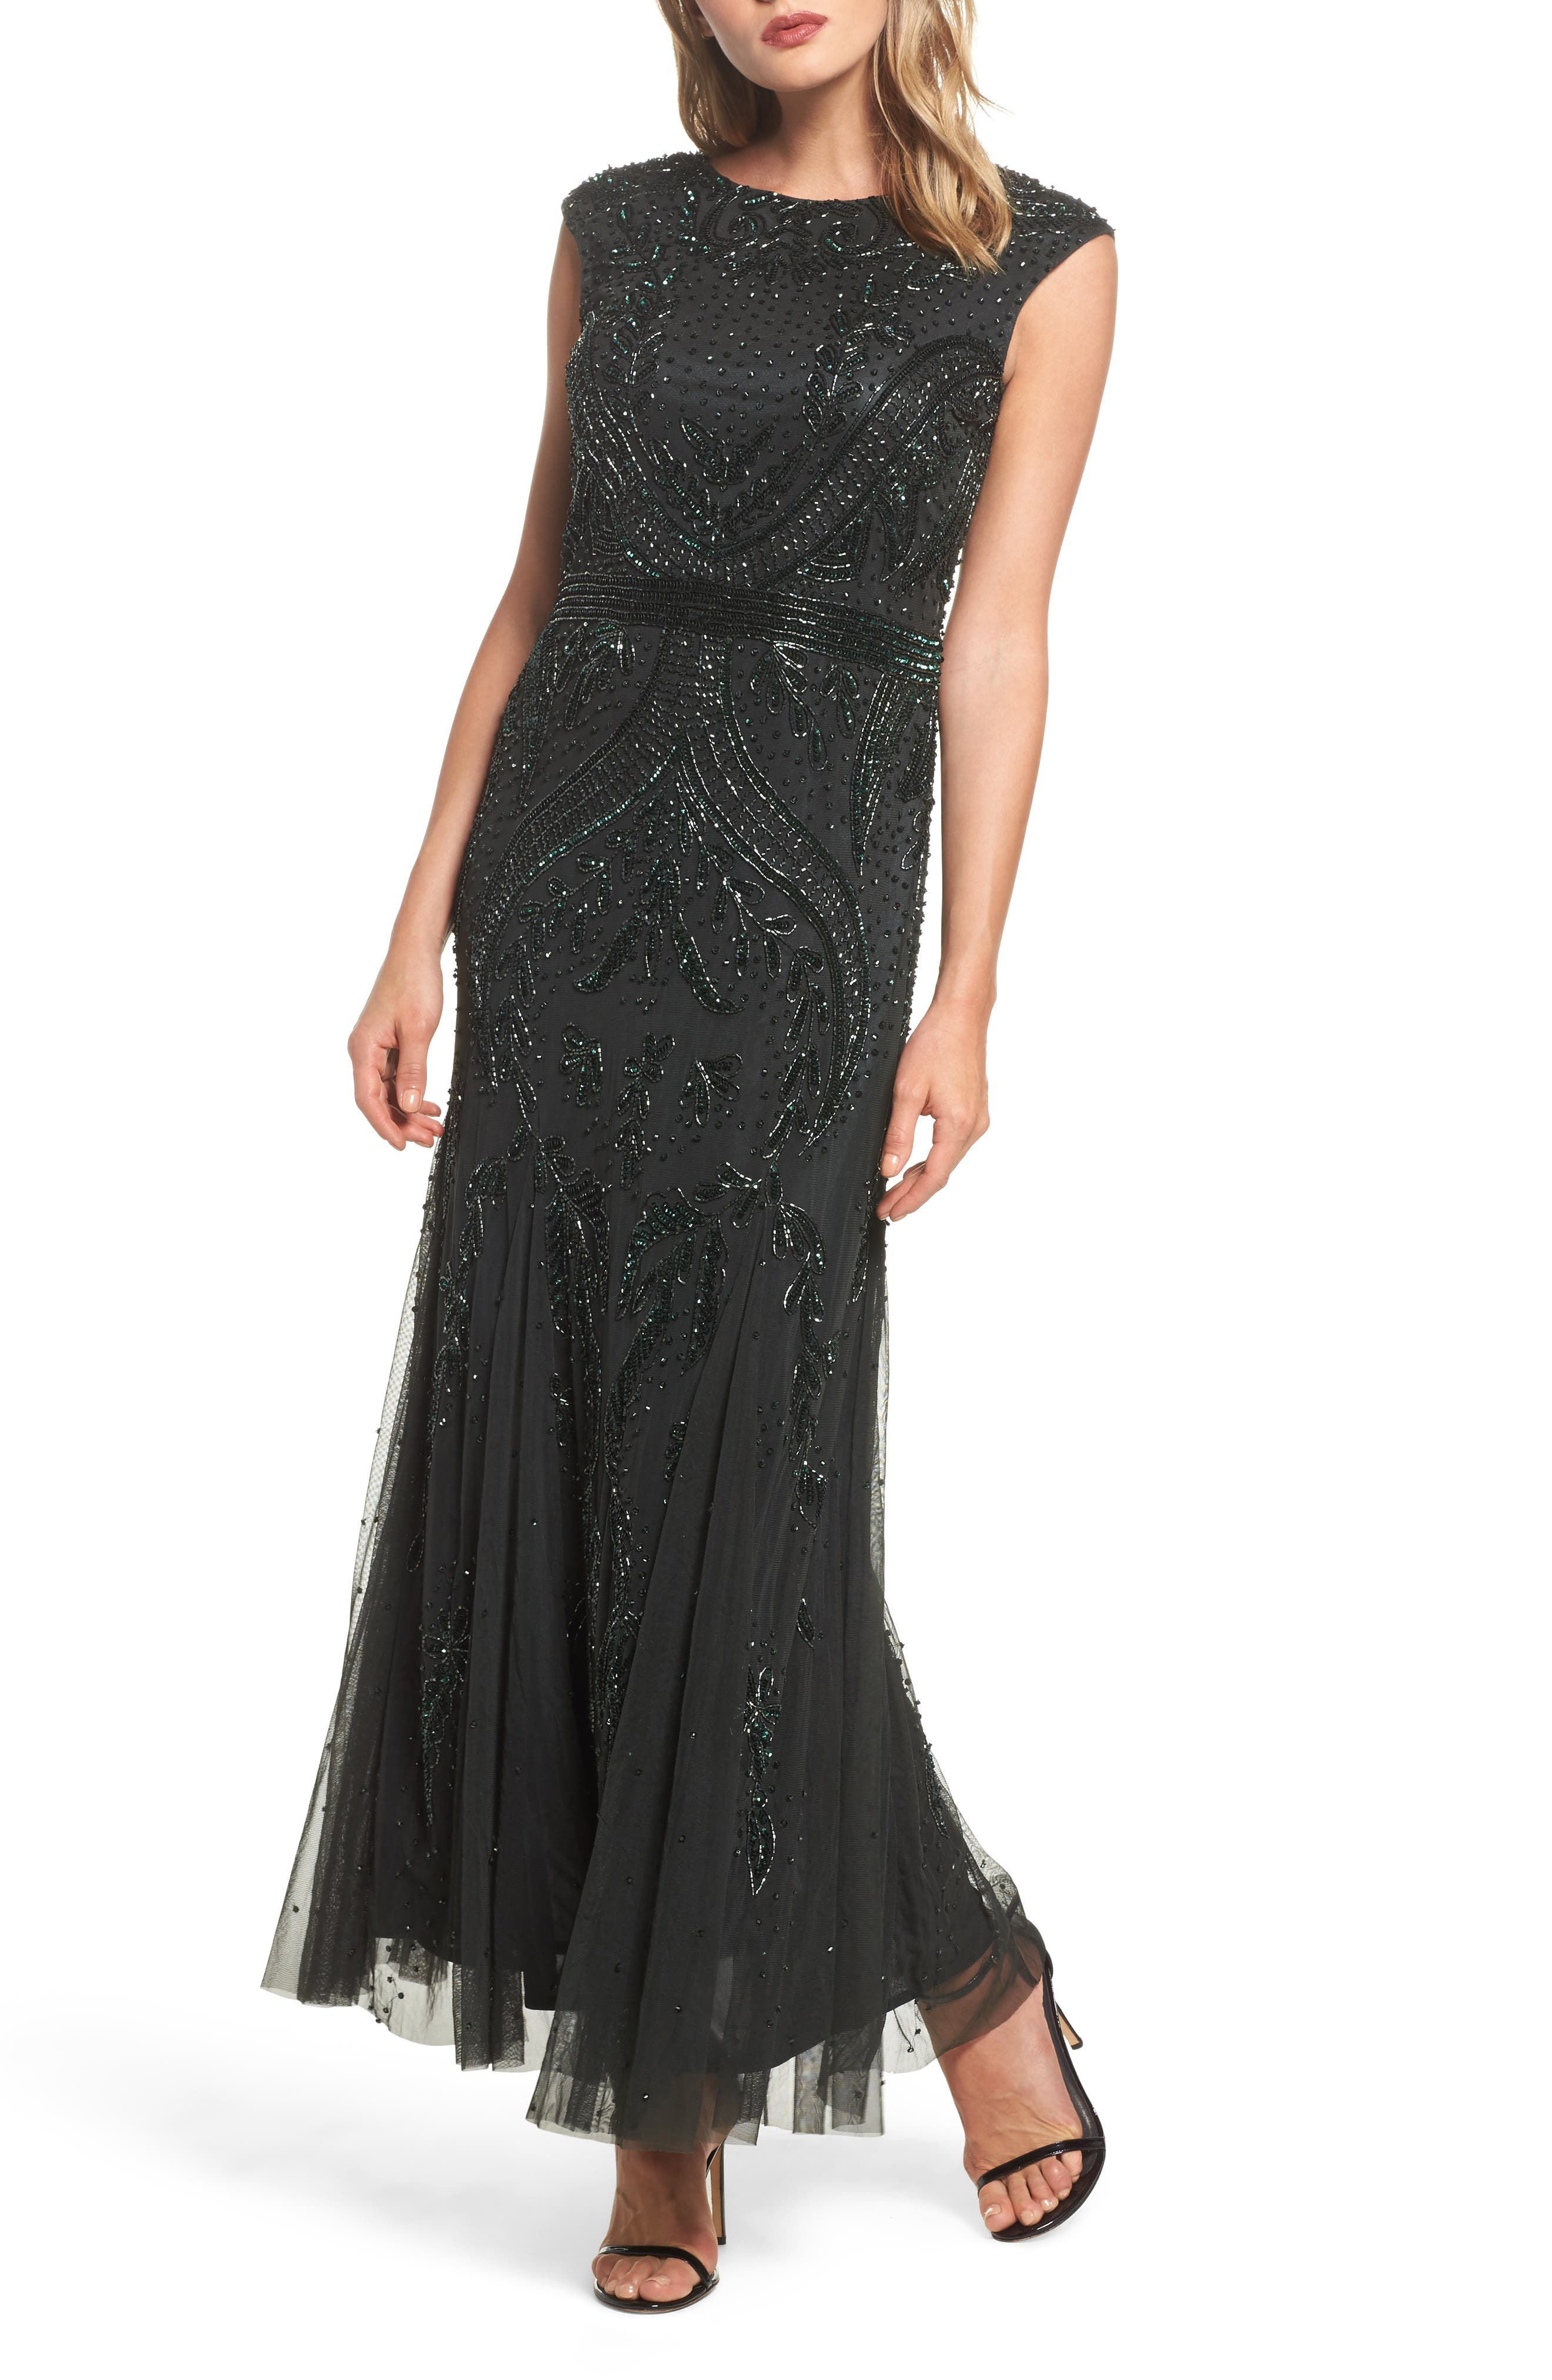 Main Image - Pisarro Nights Embellished Mesh Godet Gown